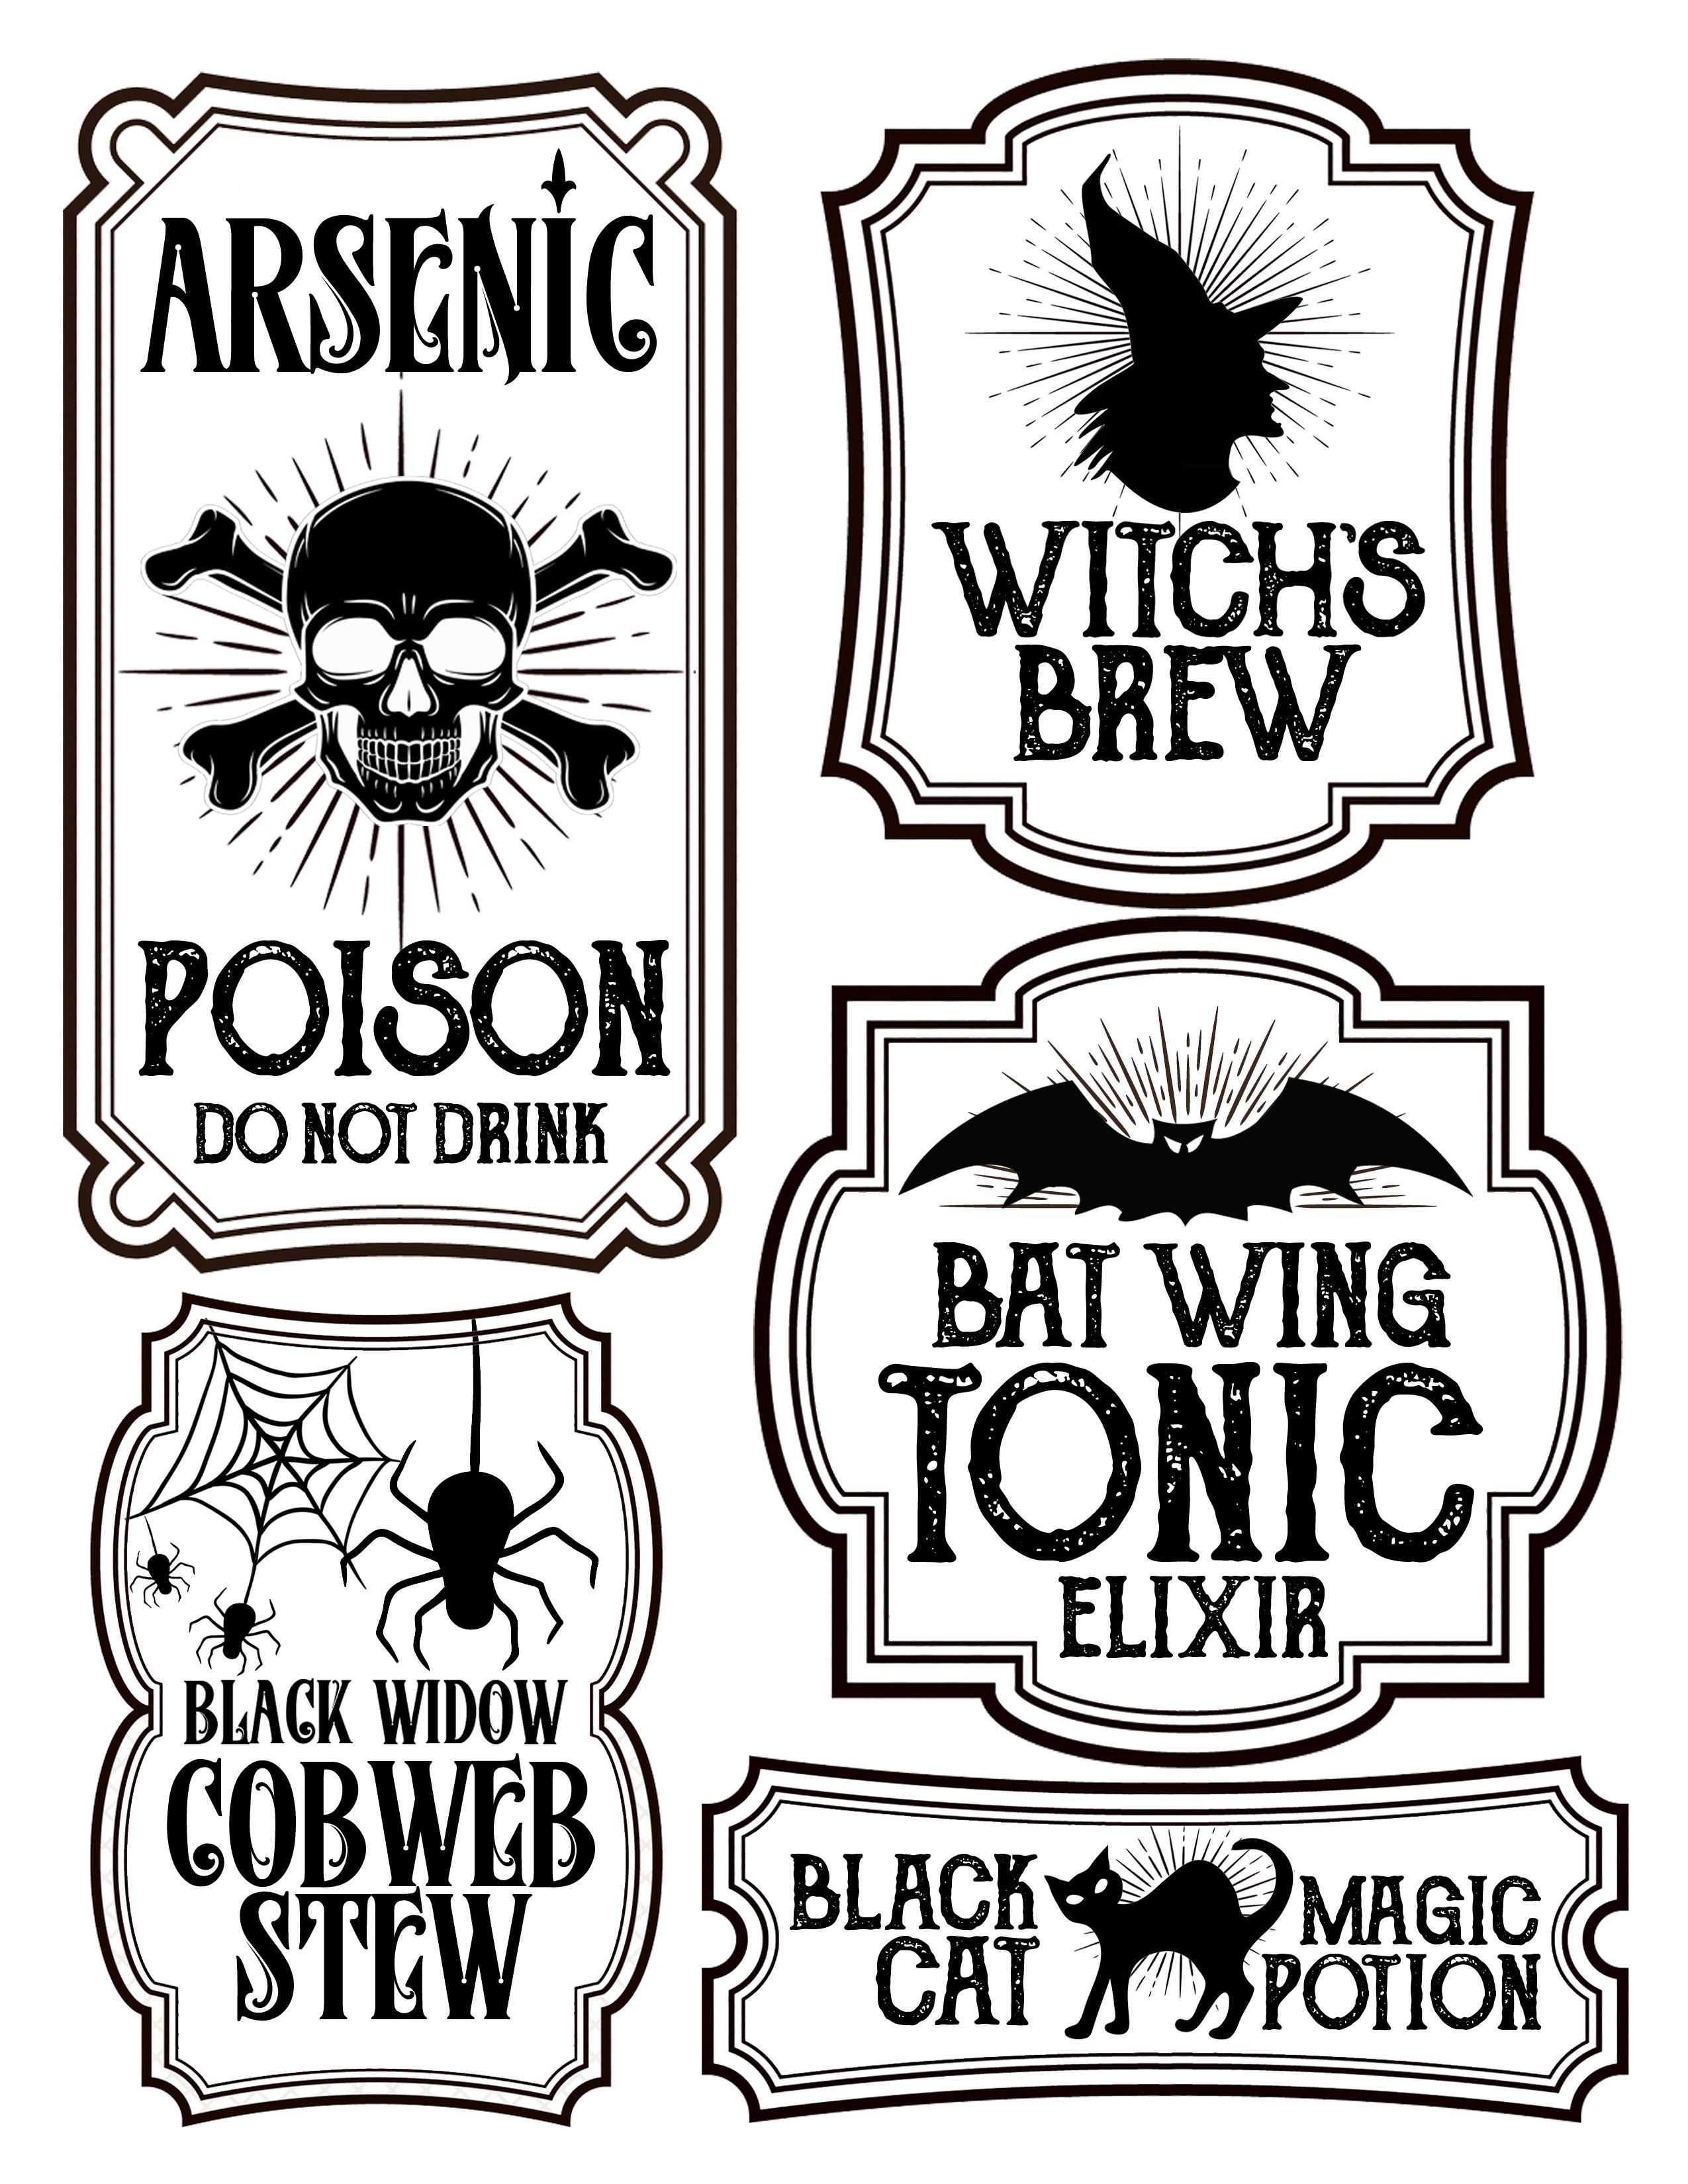 Halloween Bottle Labels - Free Printables - Potions Labels - Free Printable Halloween Bottle Labels